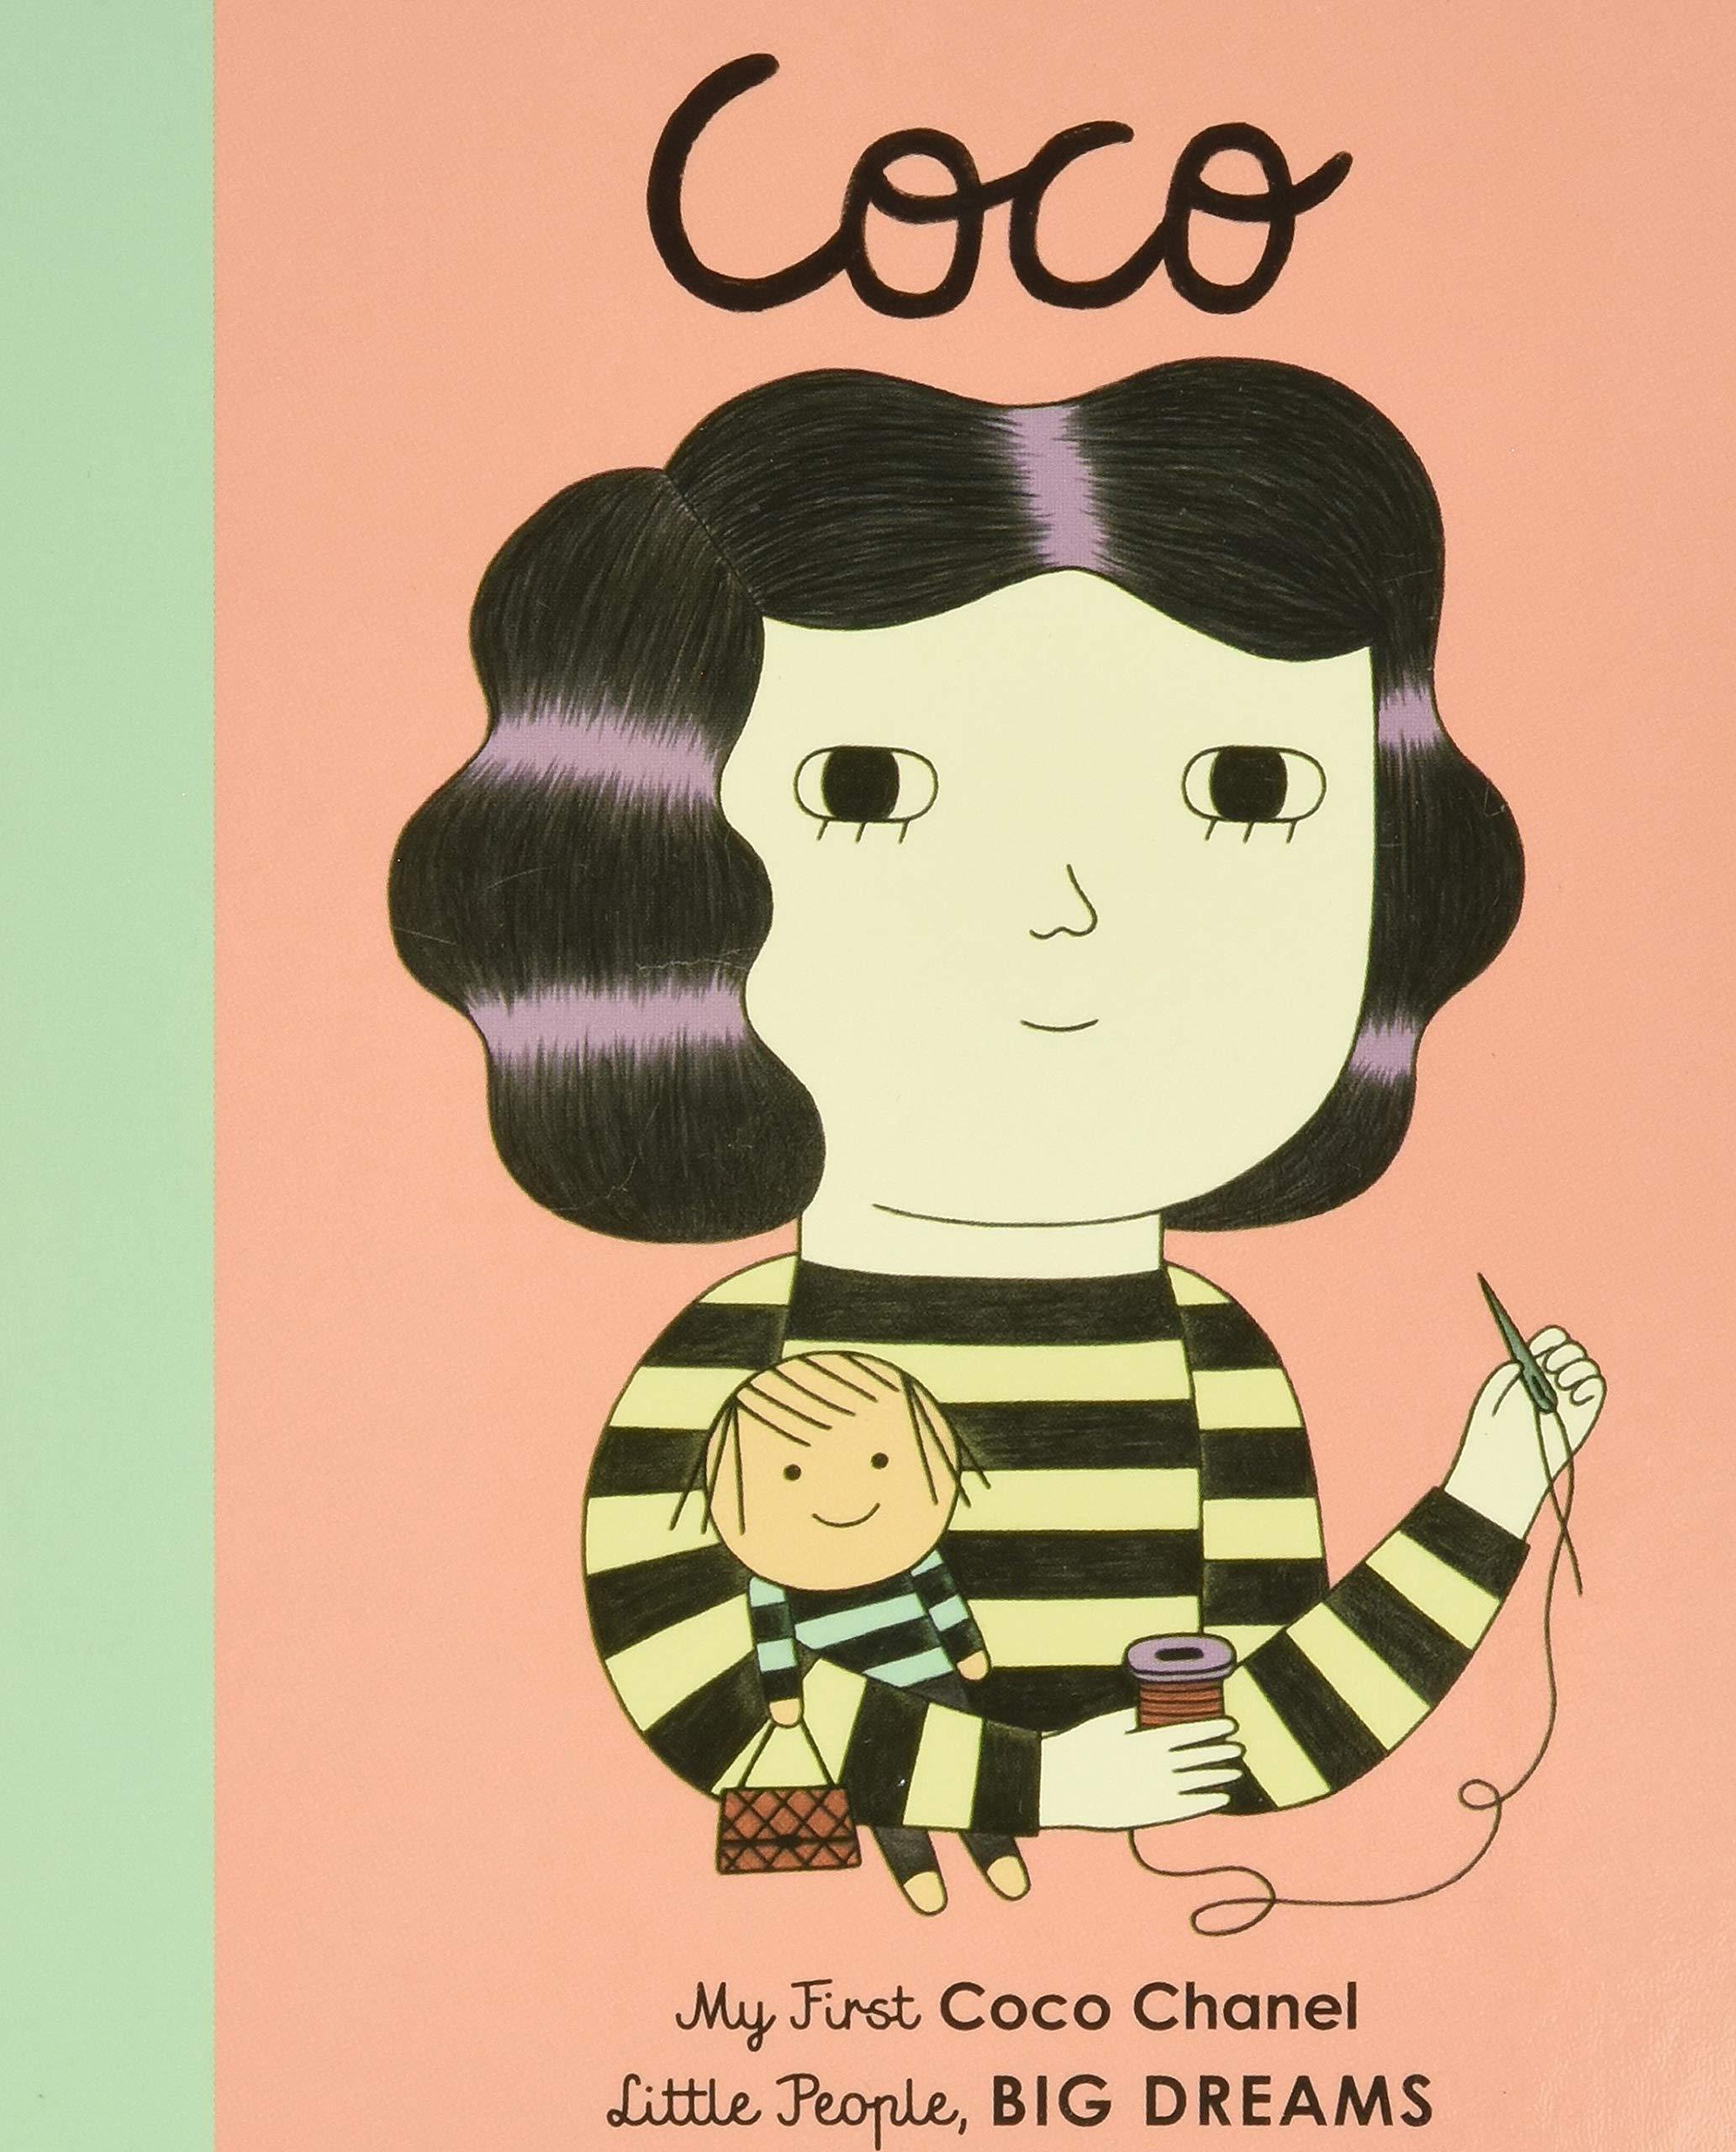 Coco Chanel: My First Coco Chanel (Little People, BIG DREAMS, 1): Sanchez  Vegara, Maria Isabel, Albero, Ana: 9781786032454: Amazon.com: Books